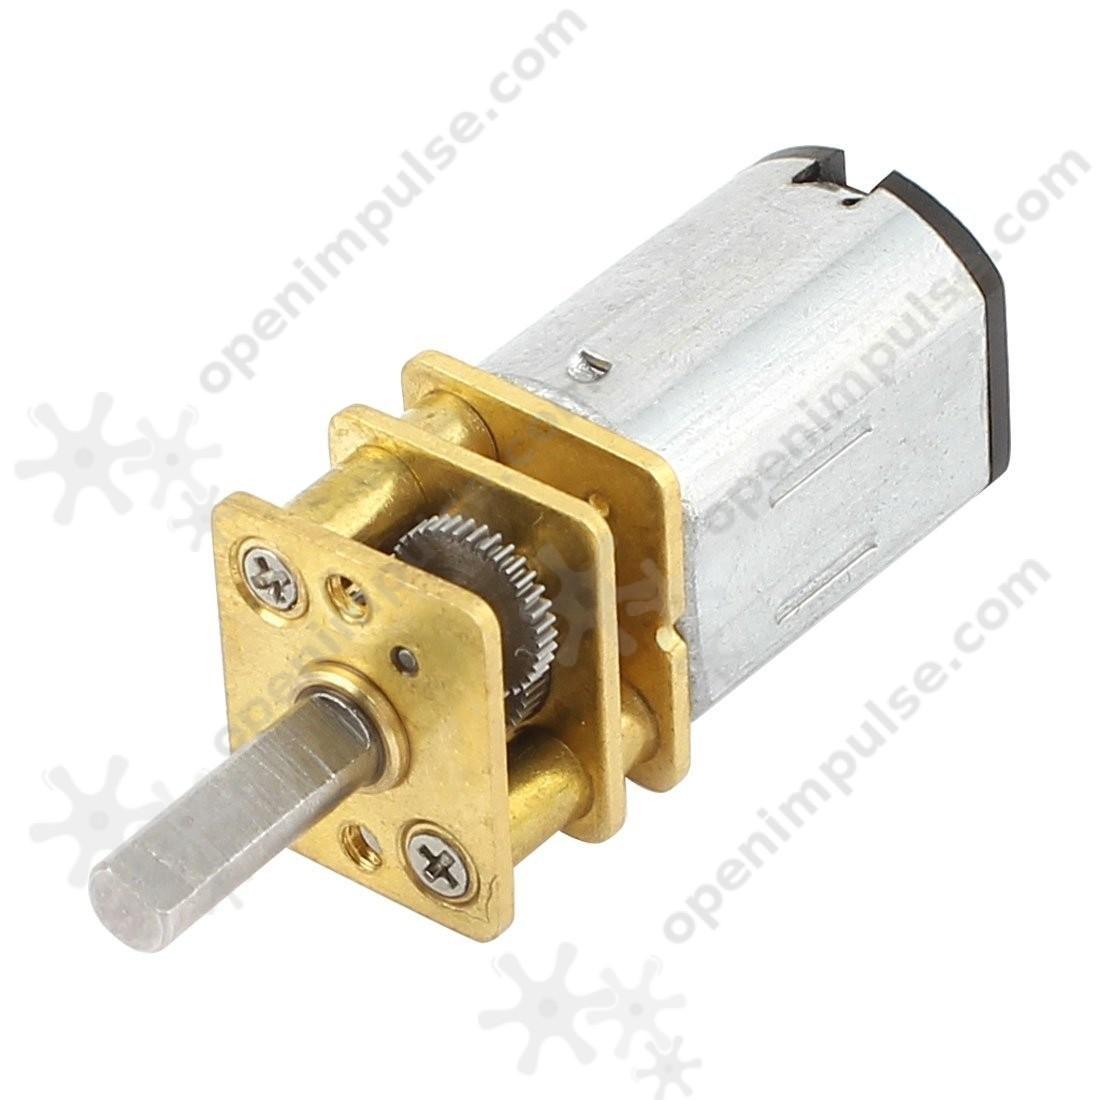 Ga12 n20 micro gearmotor 12gan20 10 500 rpm with 10 mm for Gear motor 500 rpm